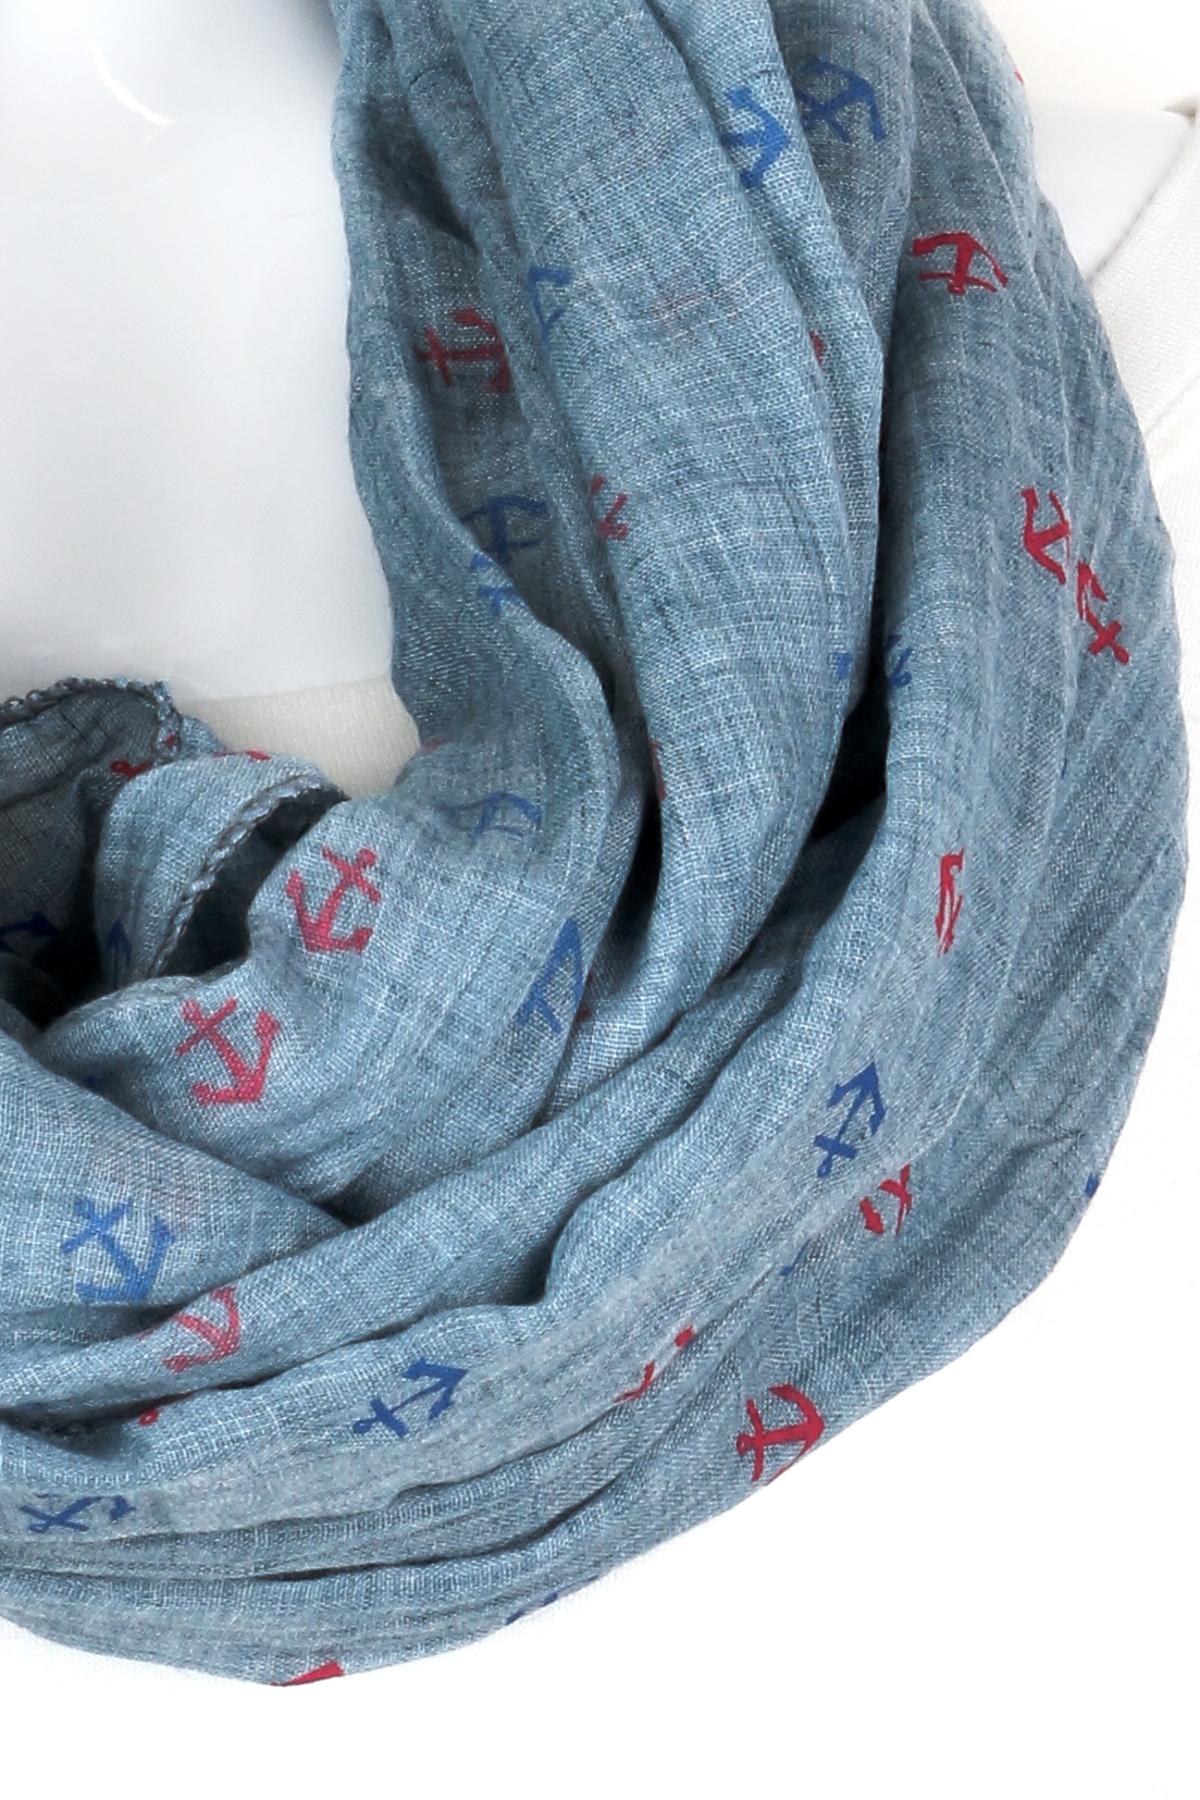 woven anchor infinity scarf